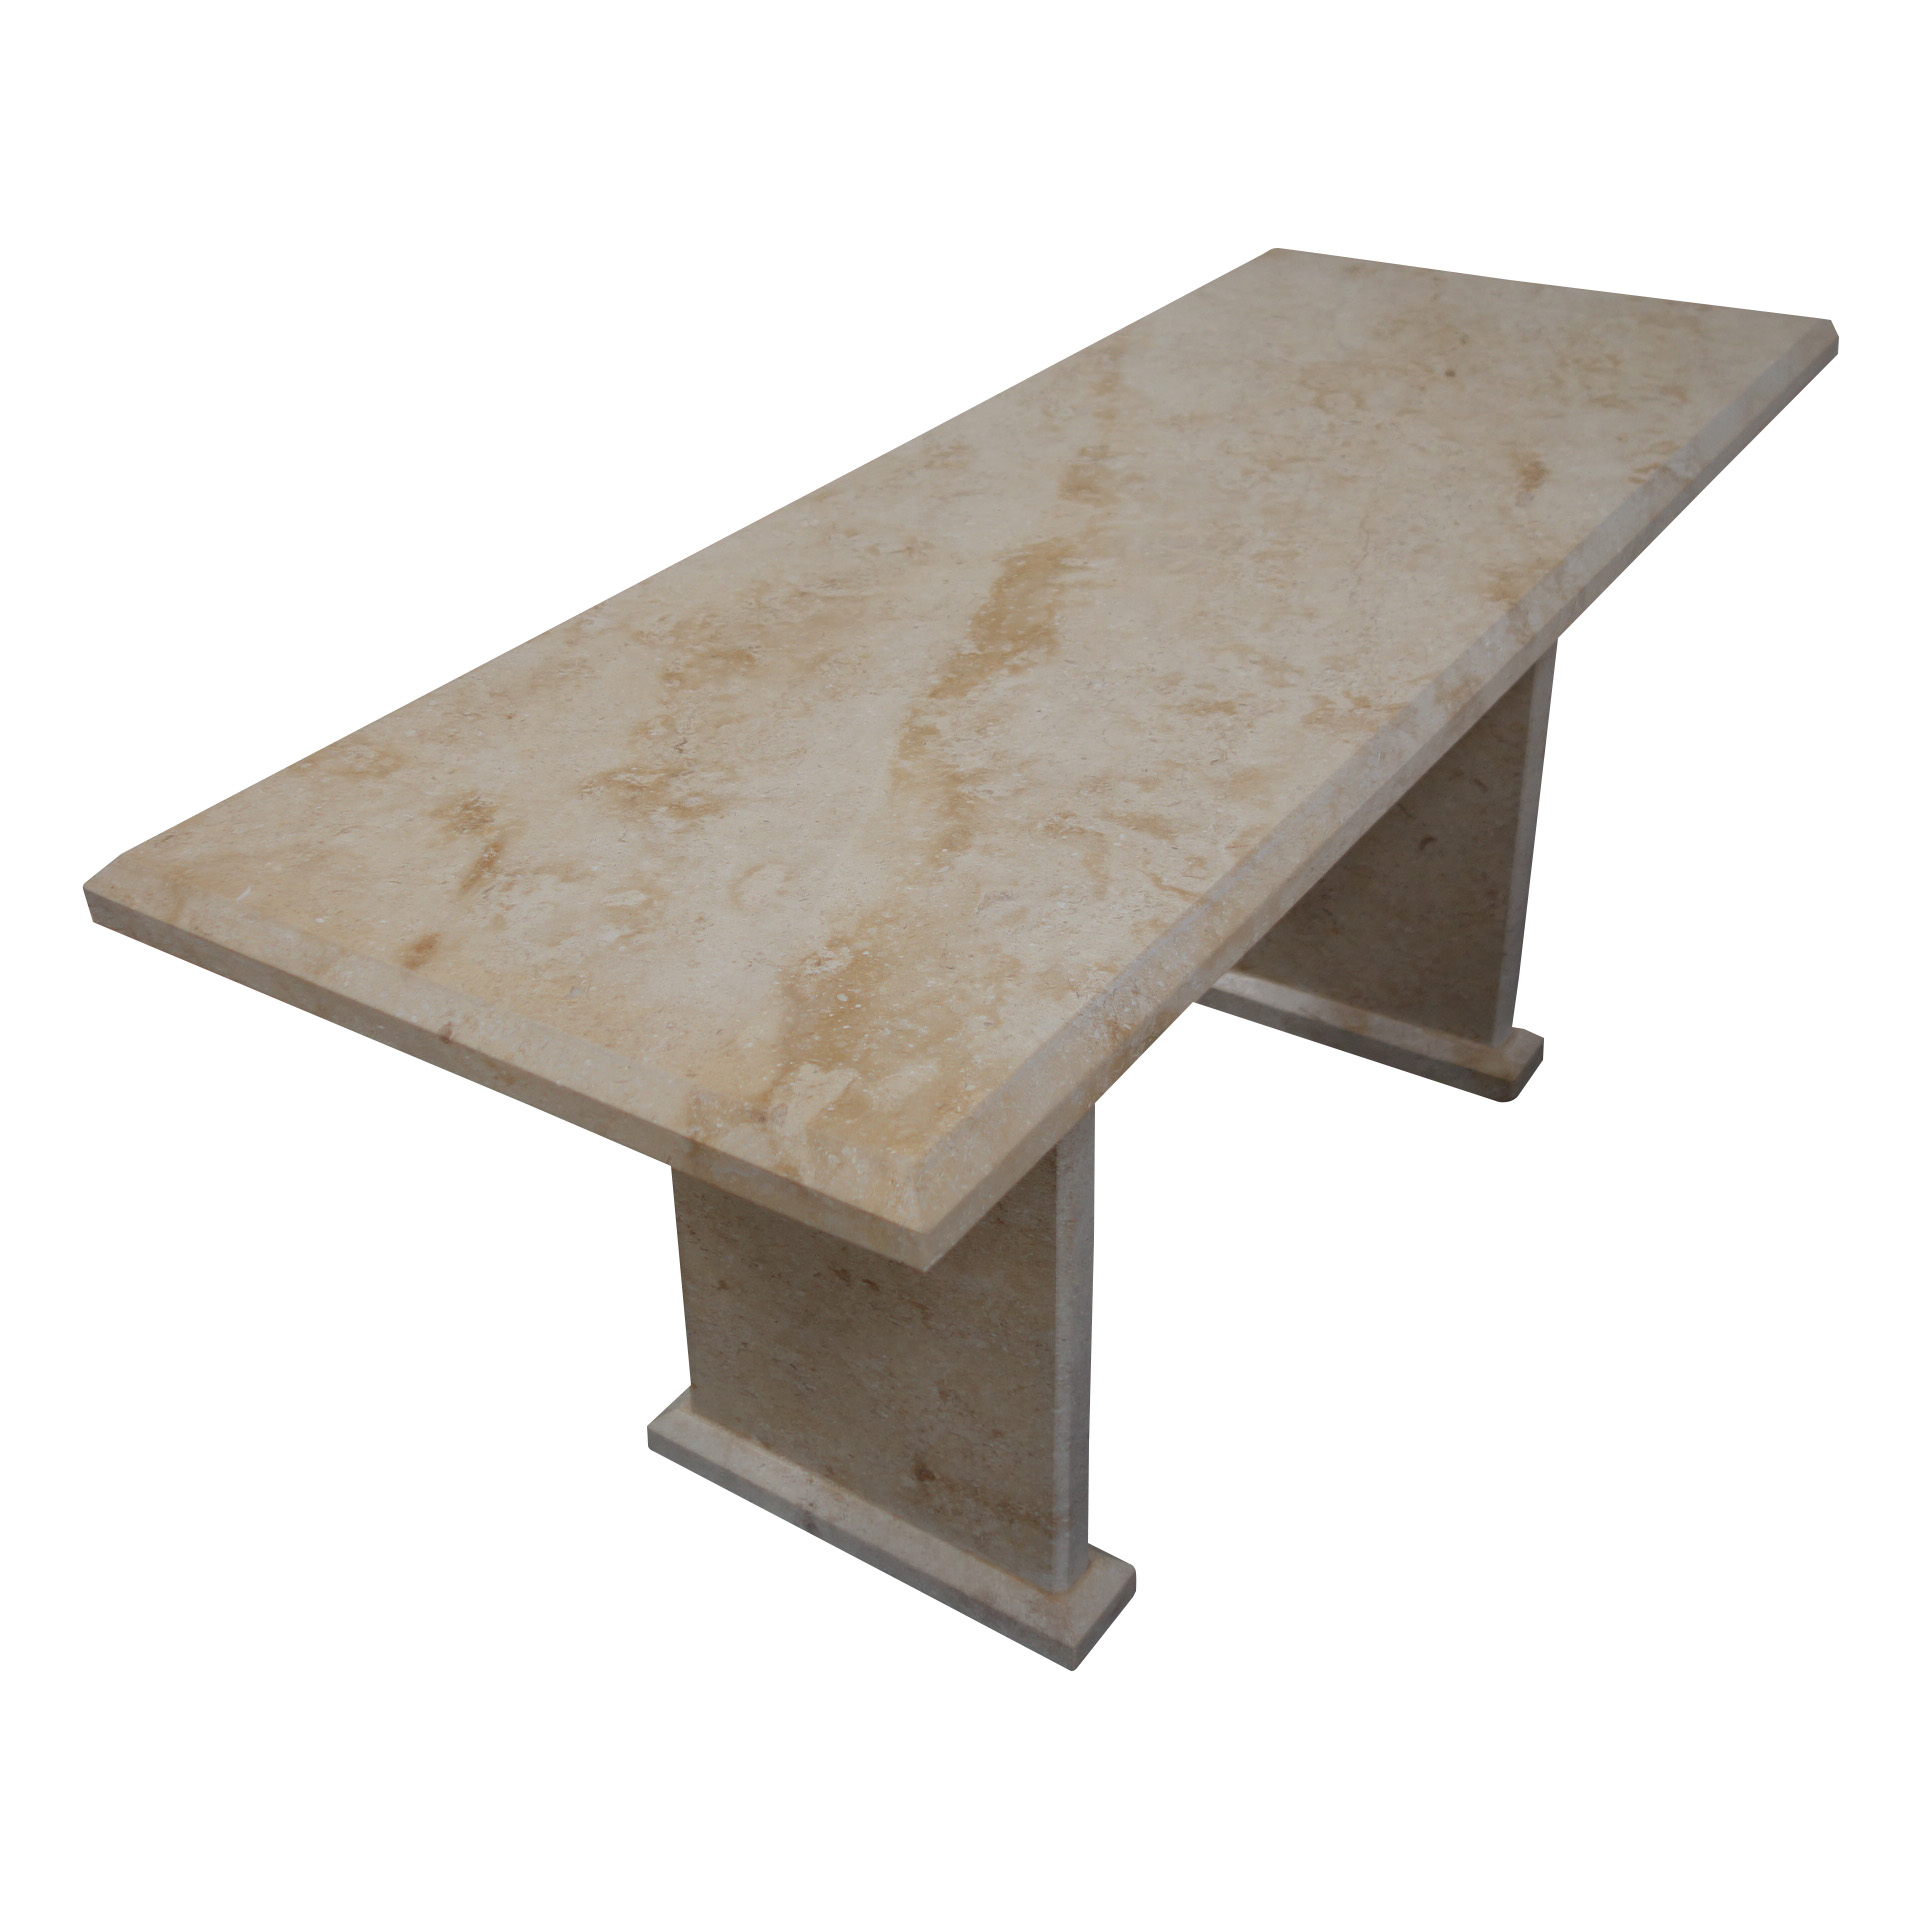 Light Yellow Limestone Table, TA-019, 1